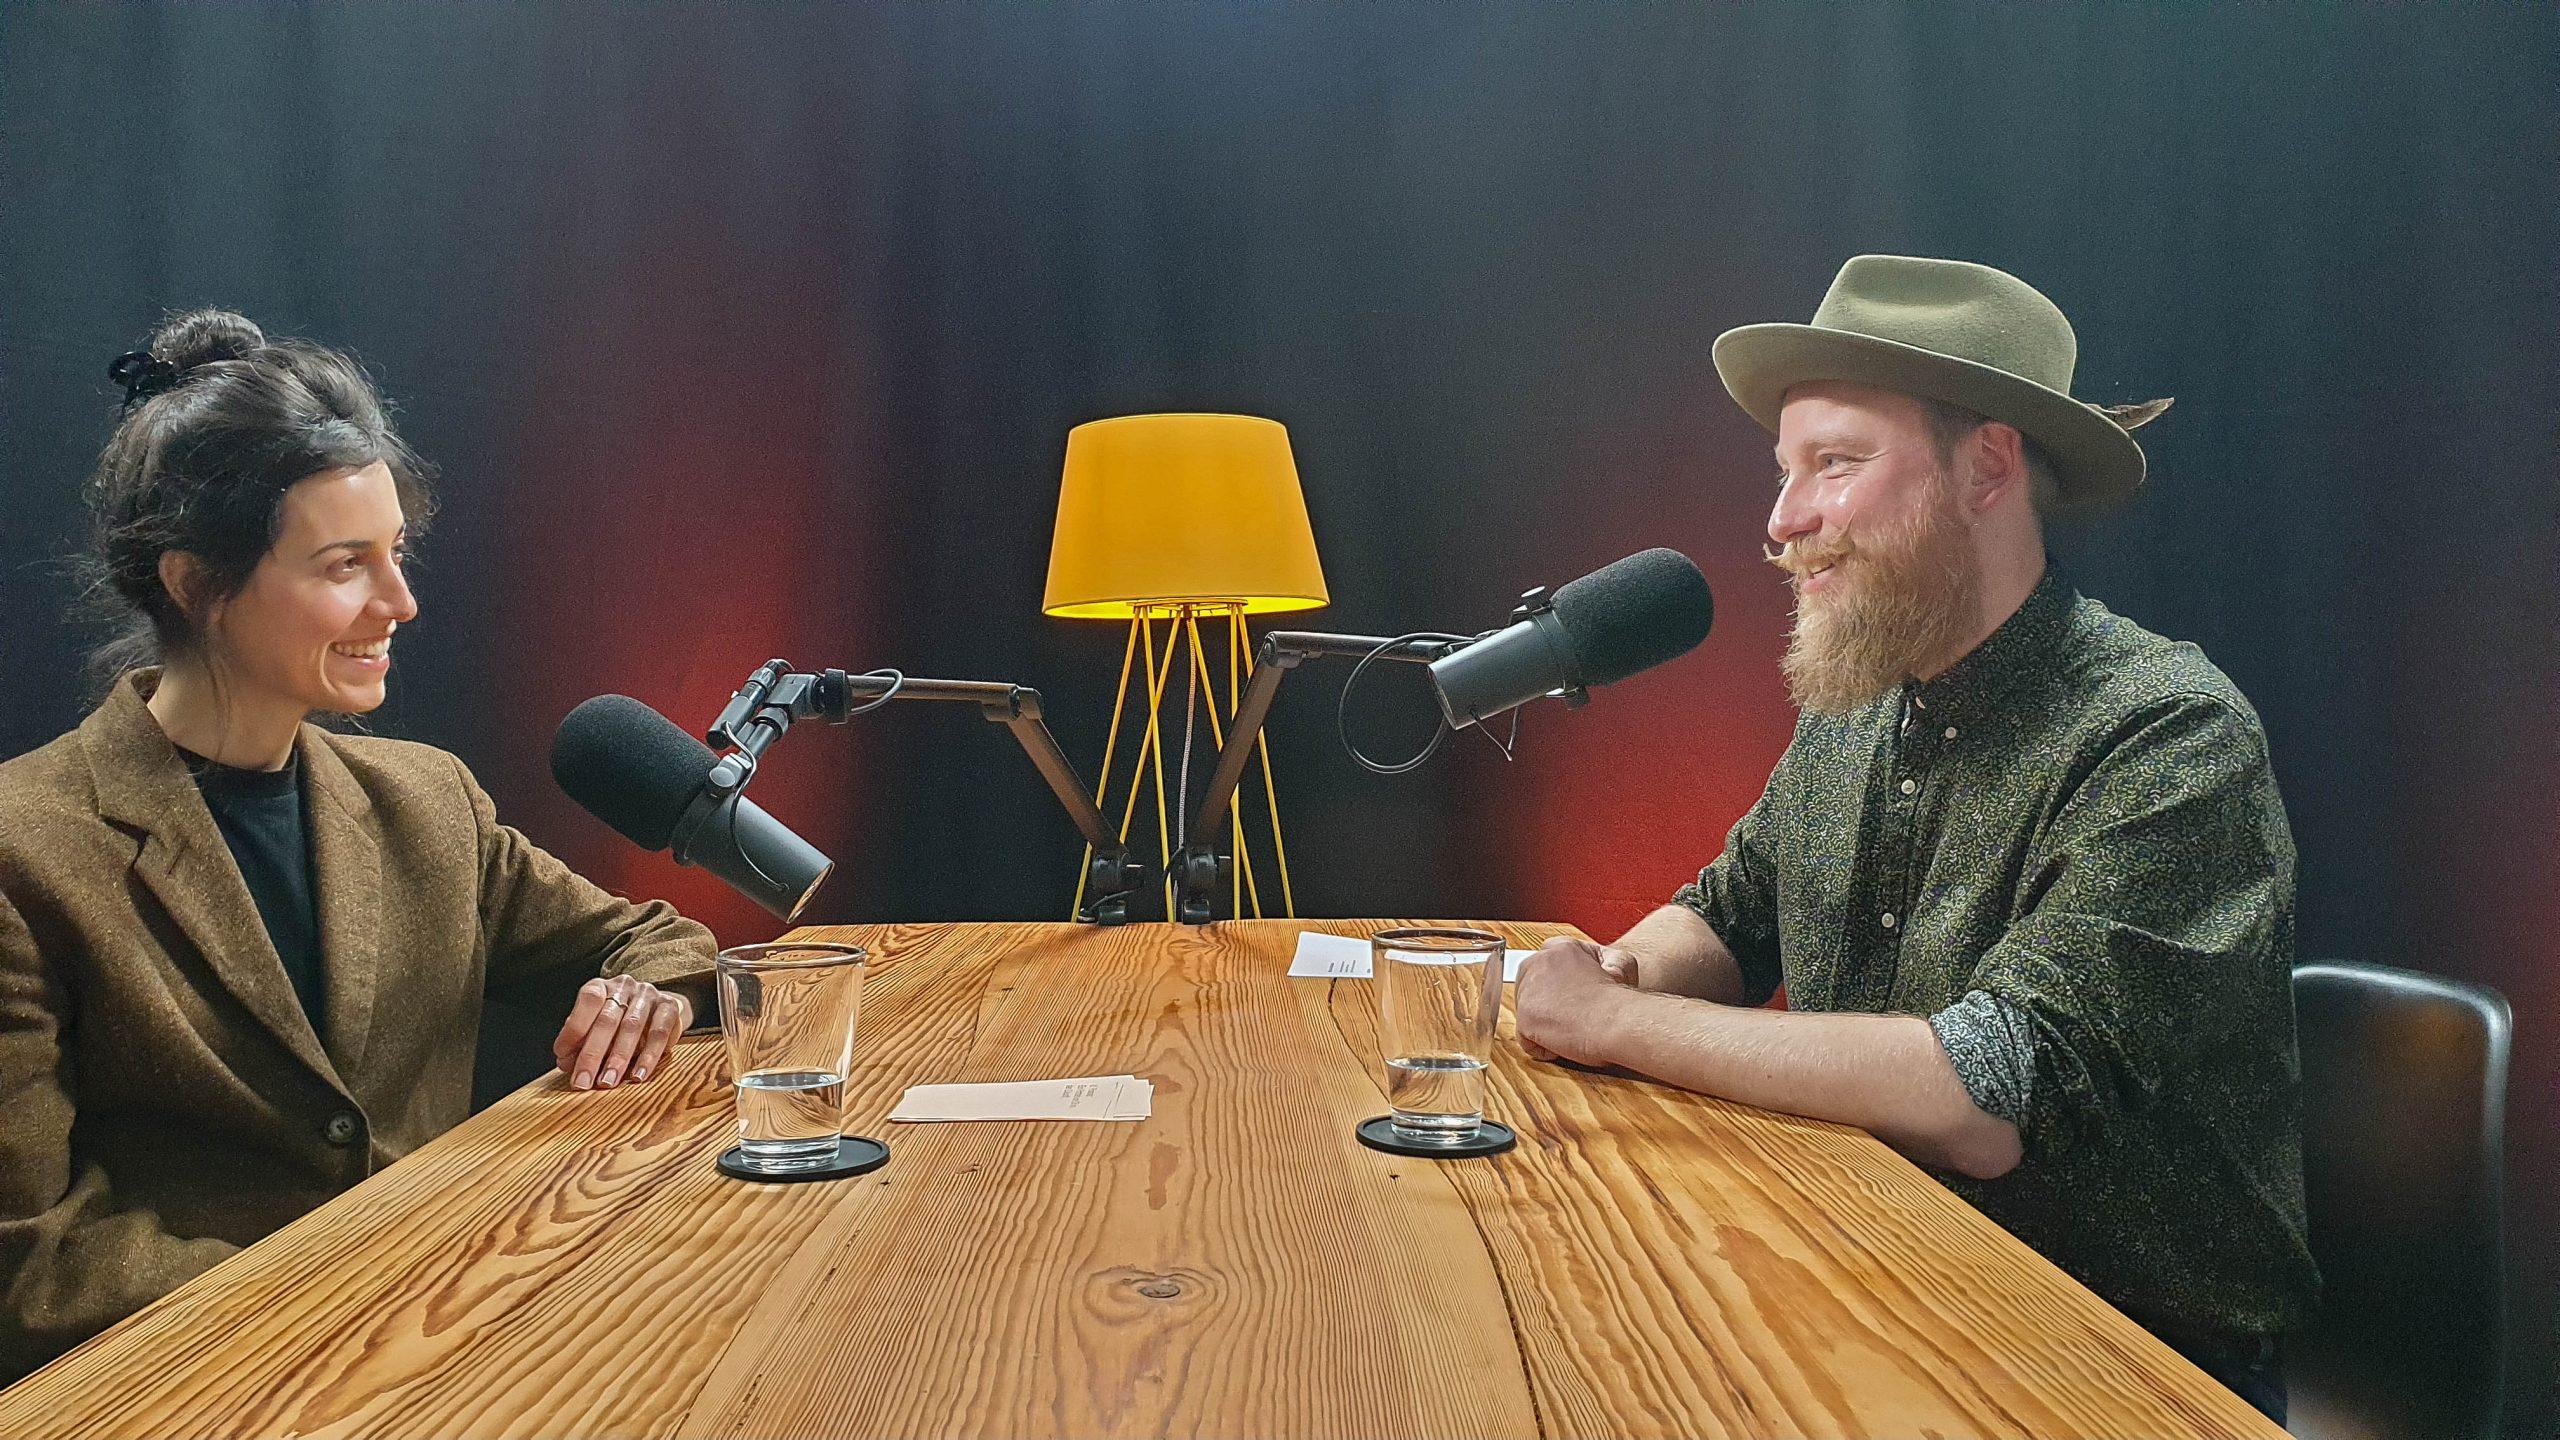 Unser Podcast